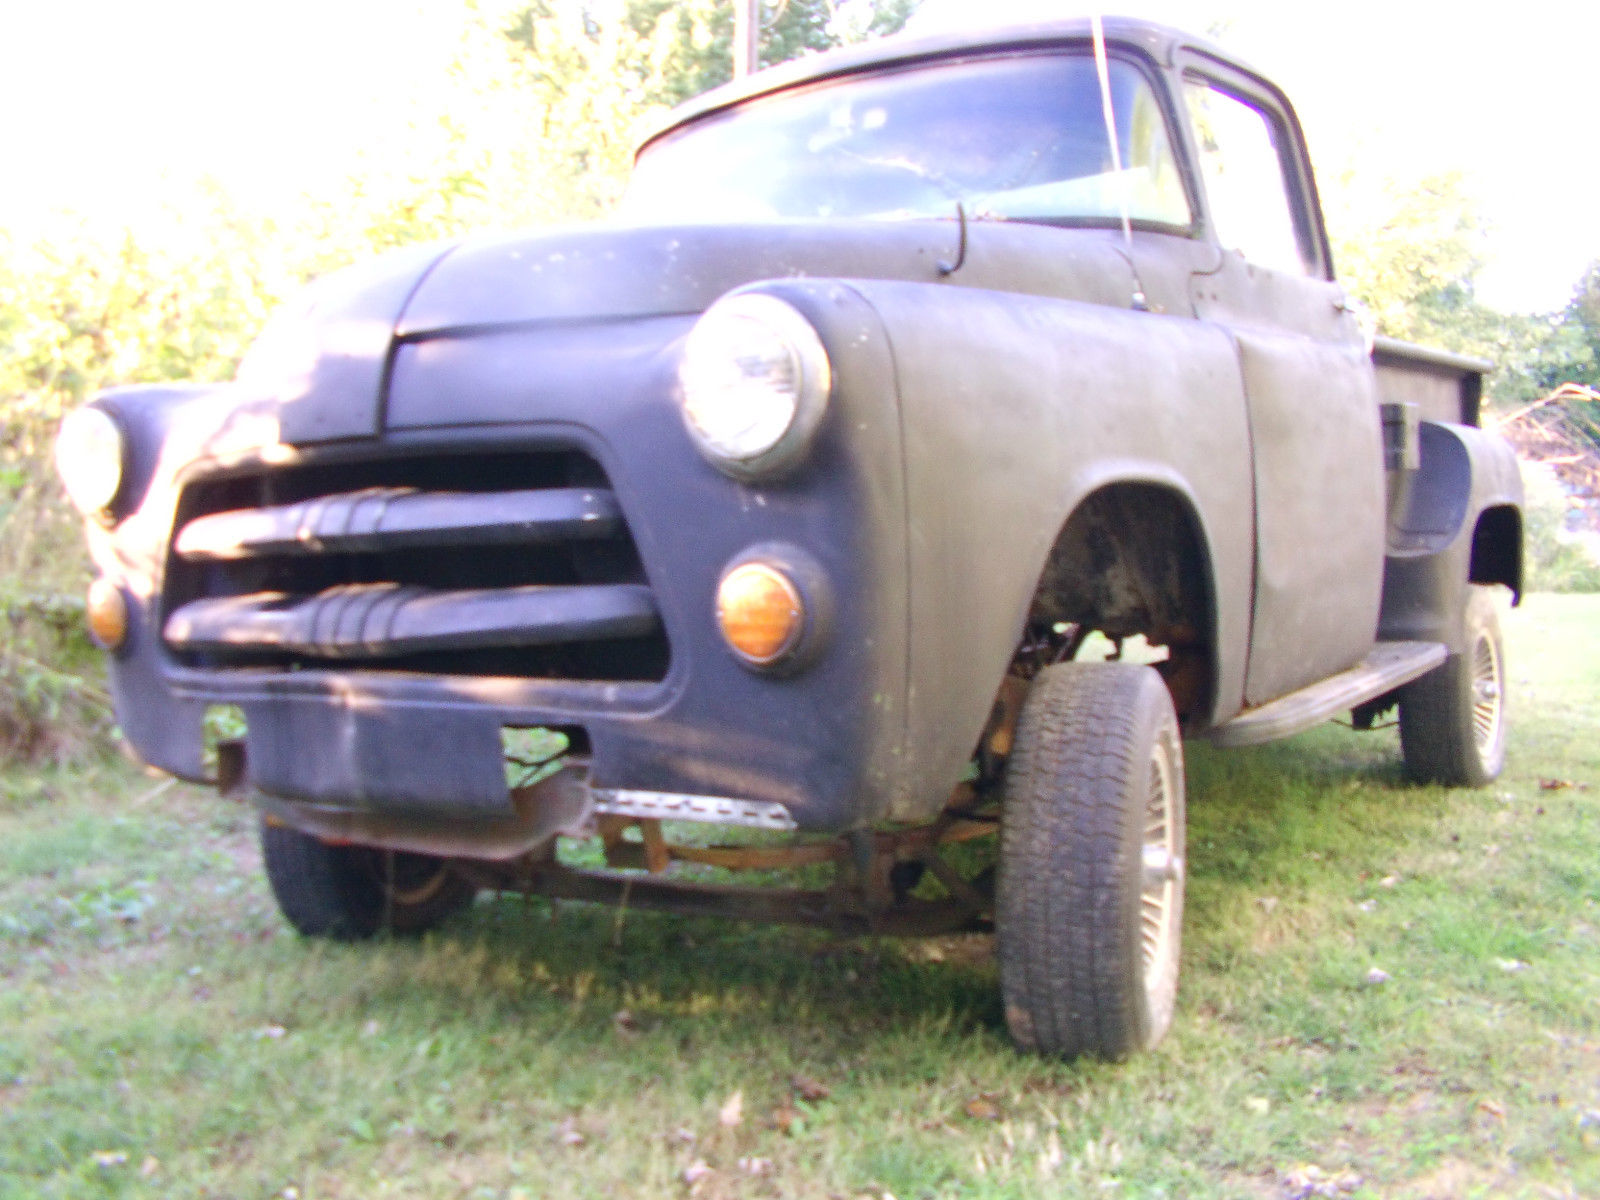 1955 Dodge Truck With A 1974 318 Engine Rat Rod Gasser Mopar Ford F100 Pick Up St Louis Other